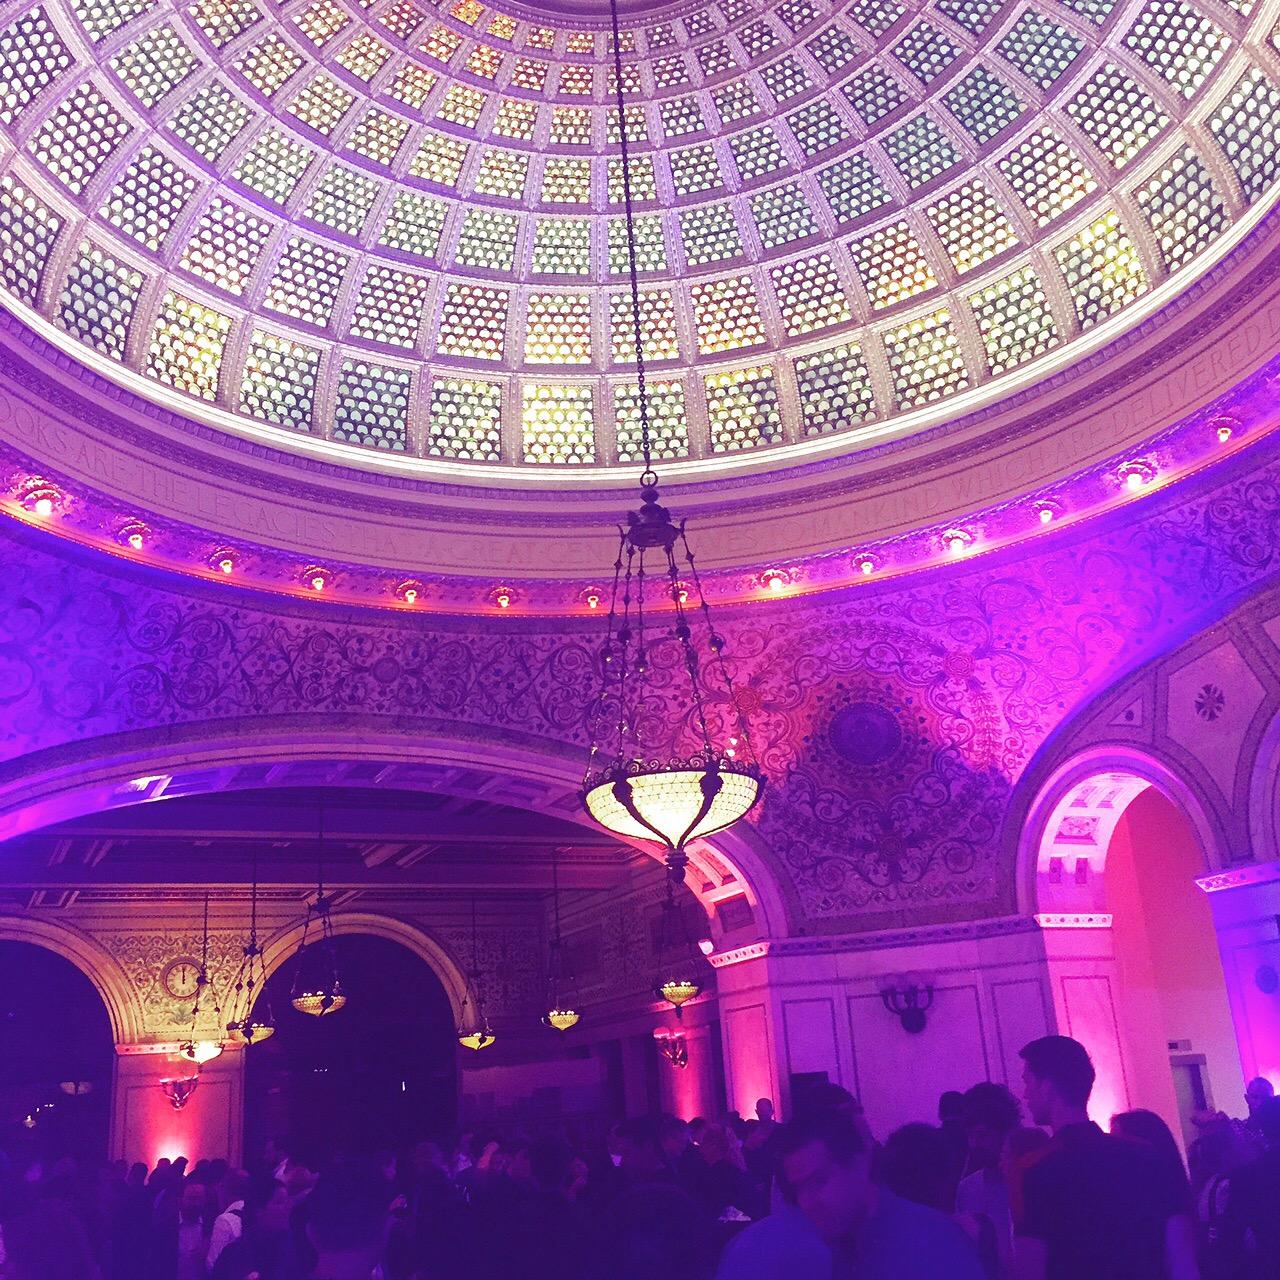 The Biennial's opening week party